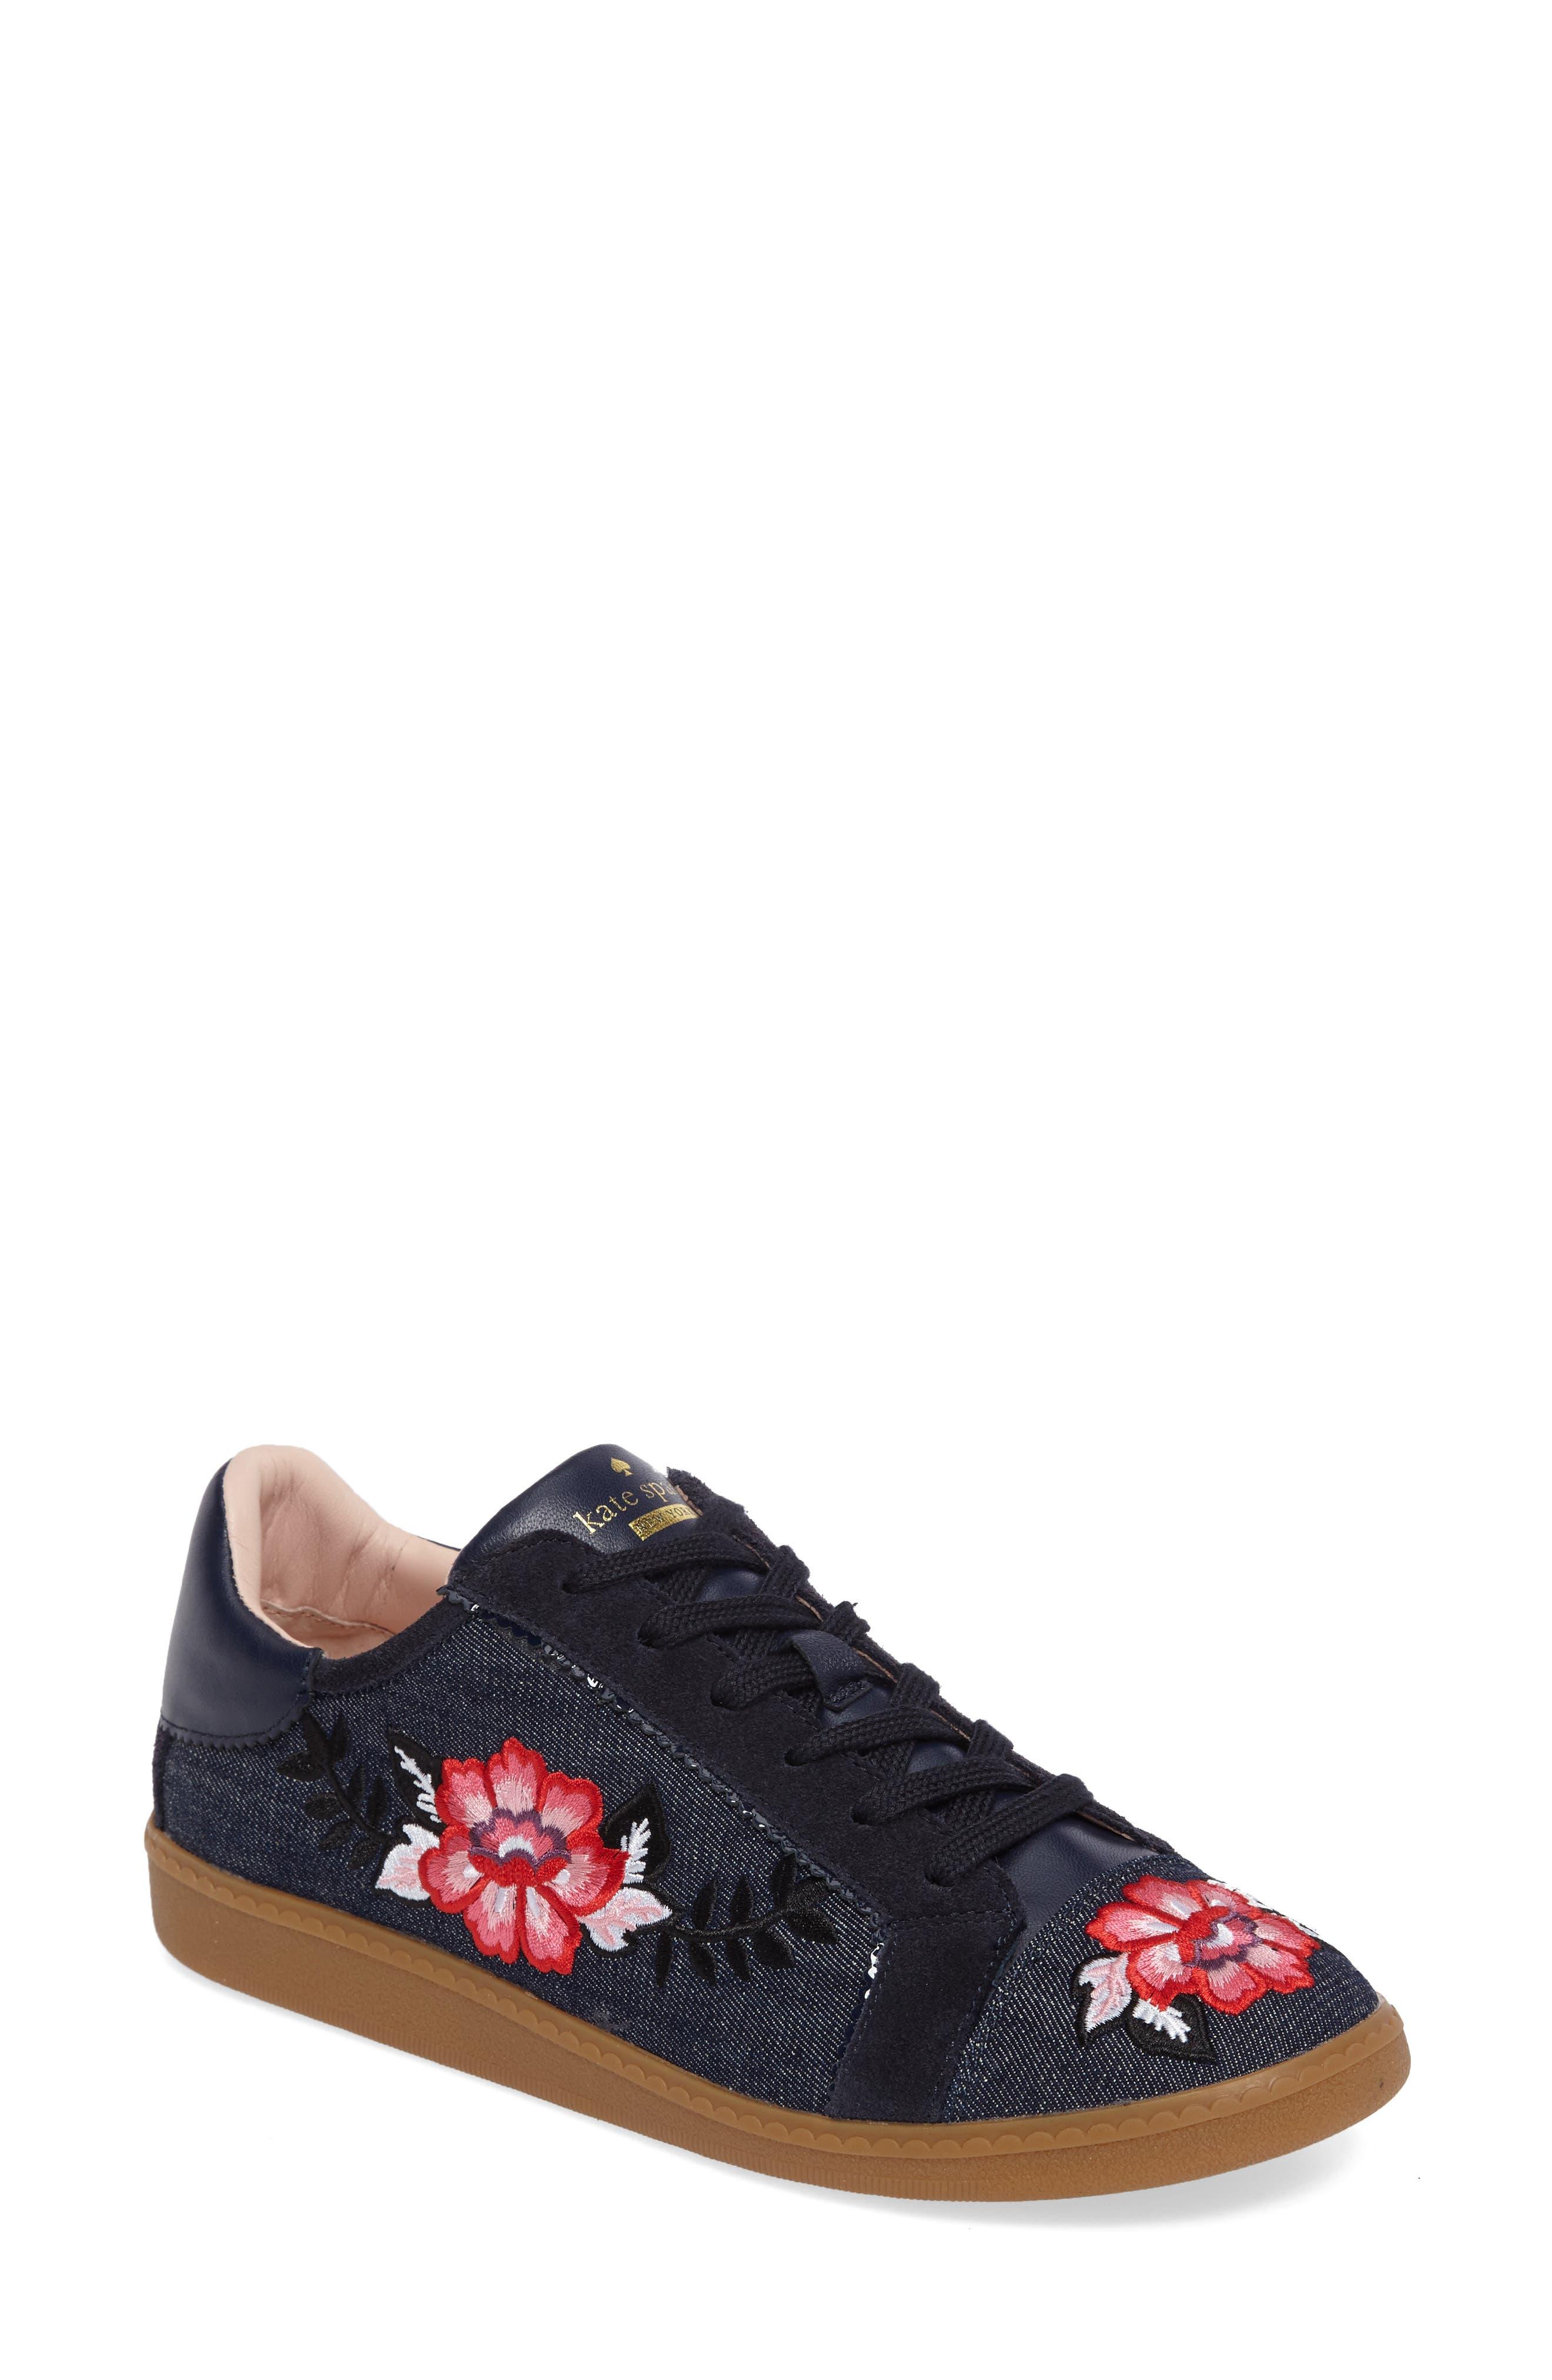 everhart sneaker,                         Main,                         color, Indigo Denim Navy Suede